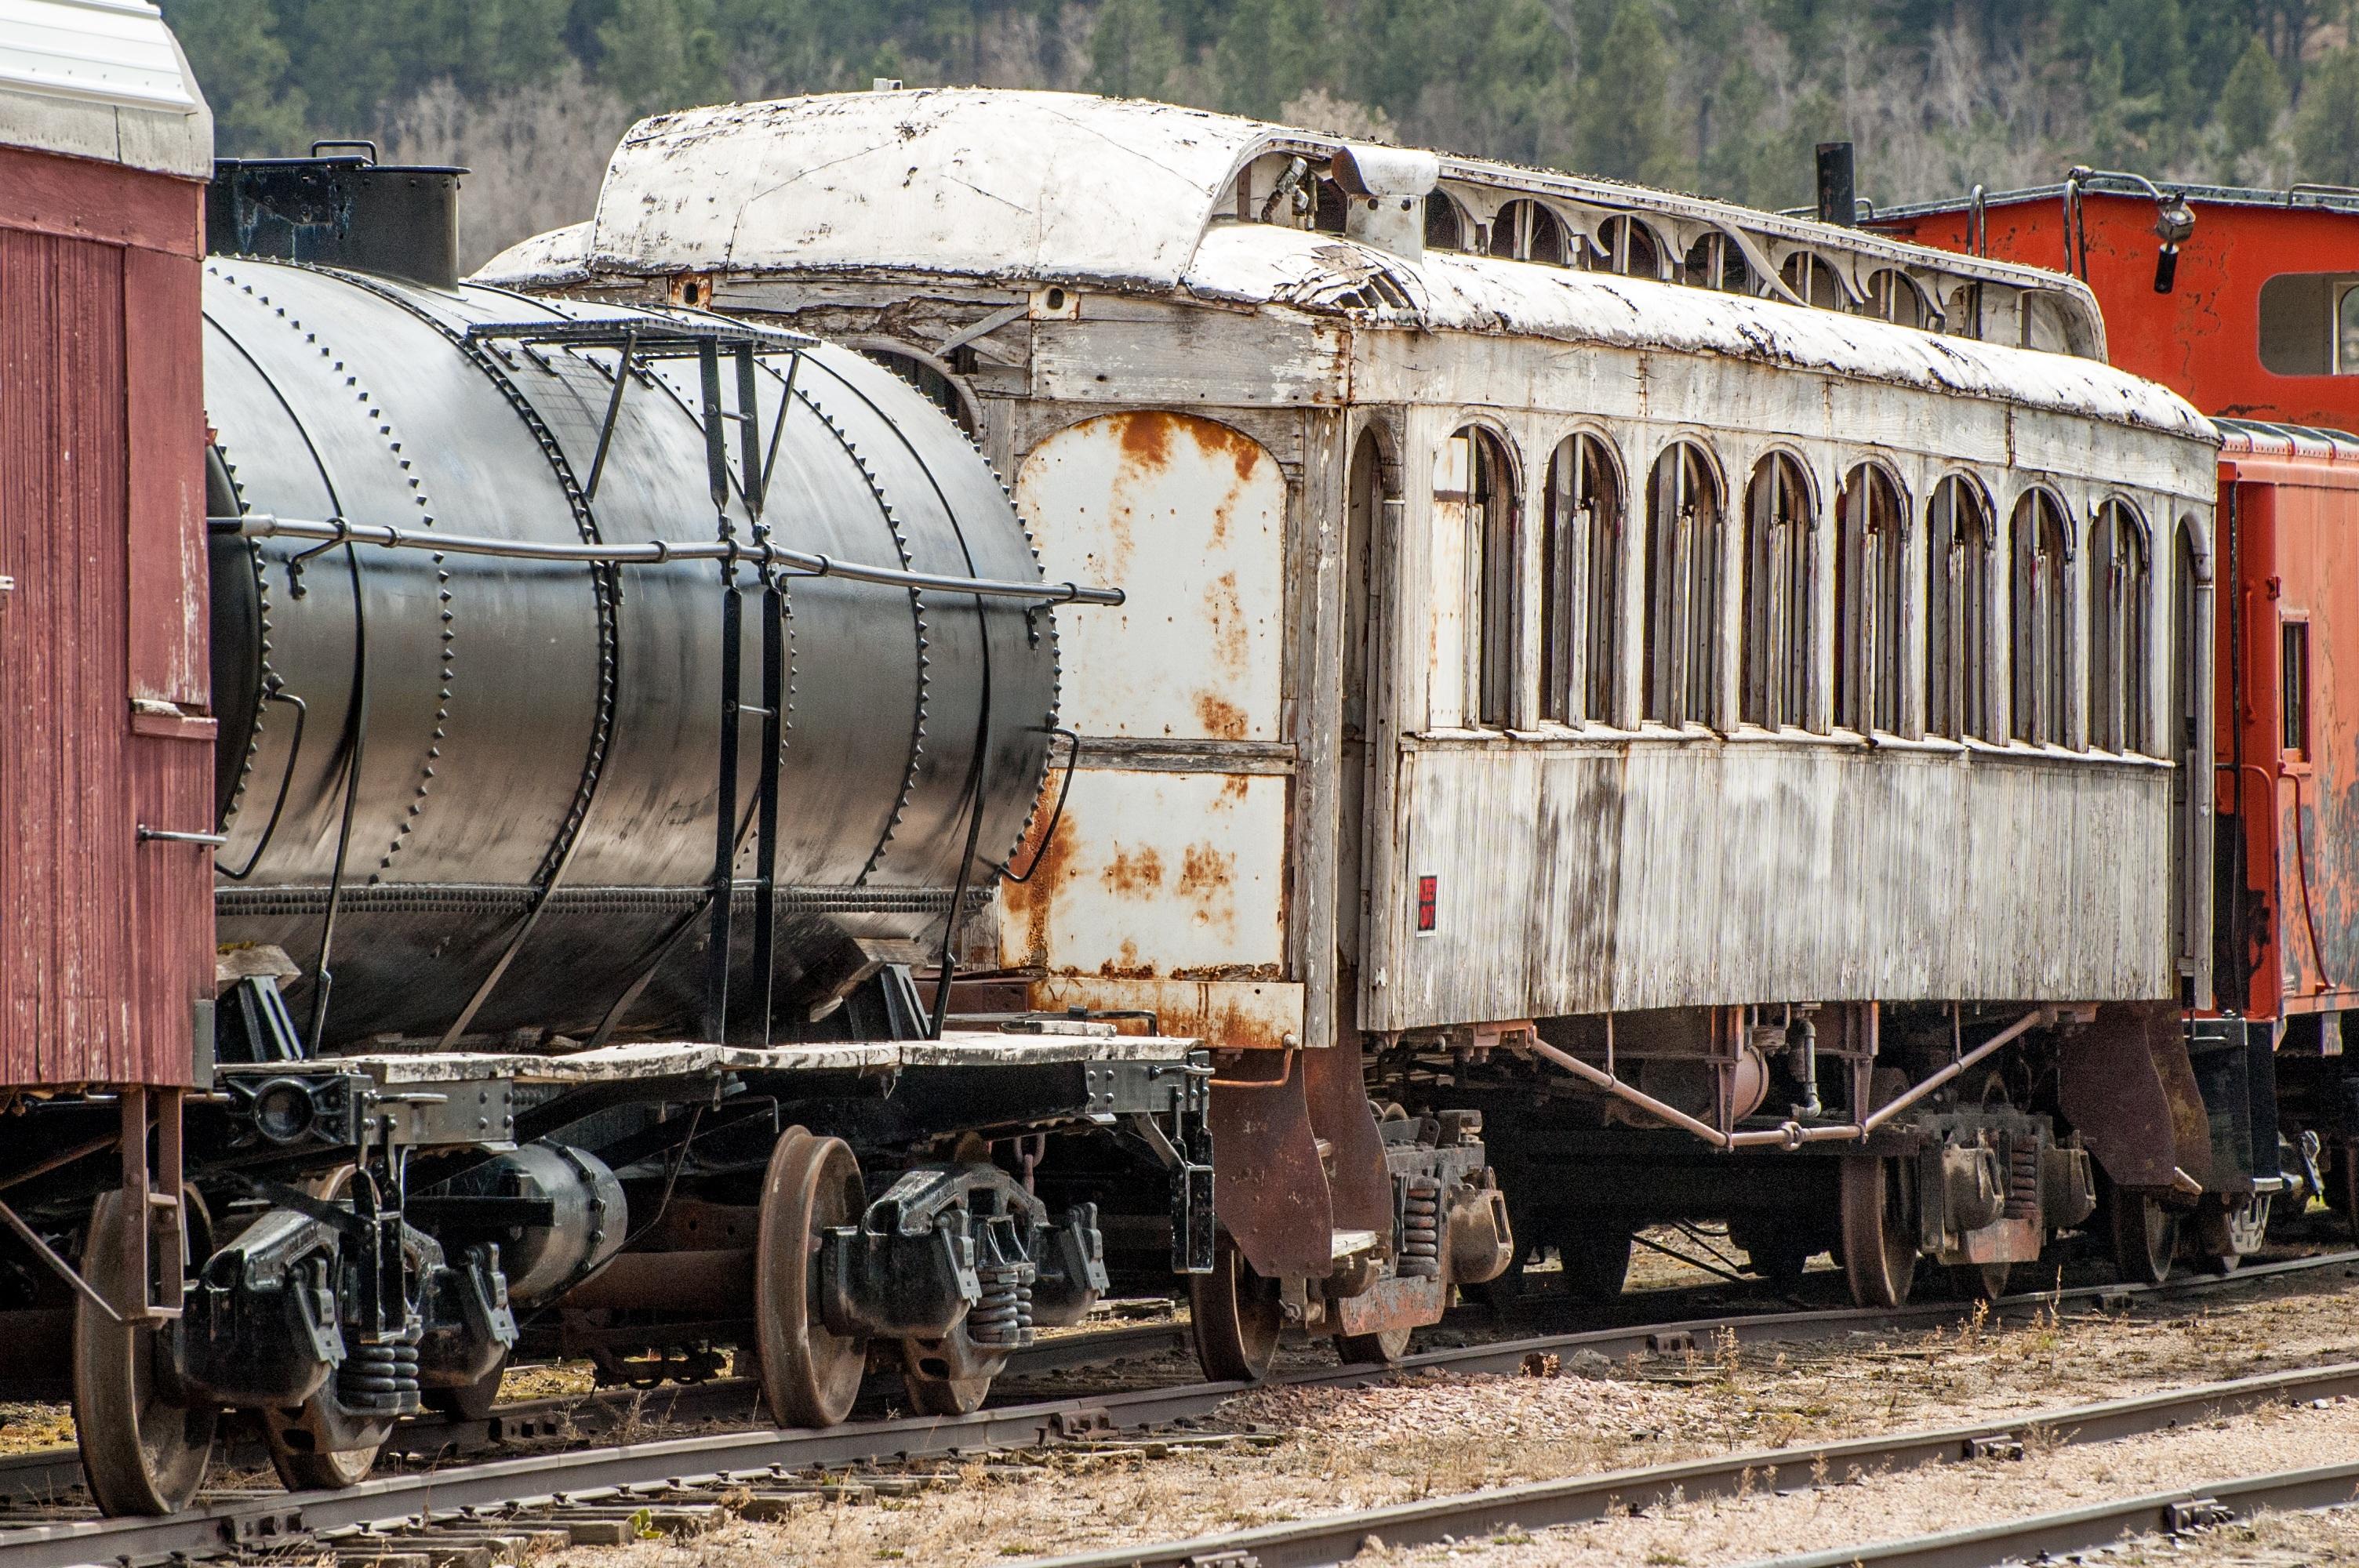 Free Images Track Railway Vintage Antique Wheel Retro Travel Steel Transportation Train Station Platform Nostalgia Black Electricity